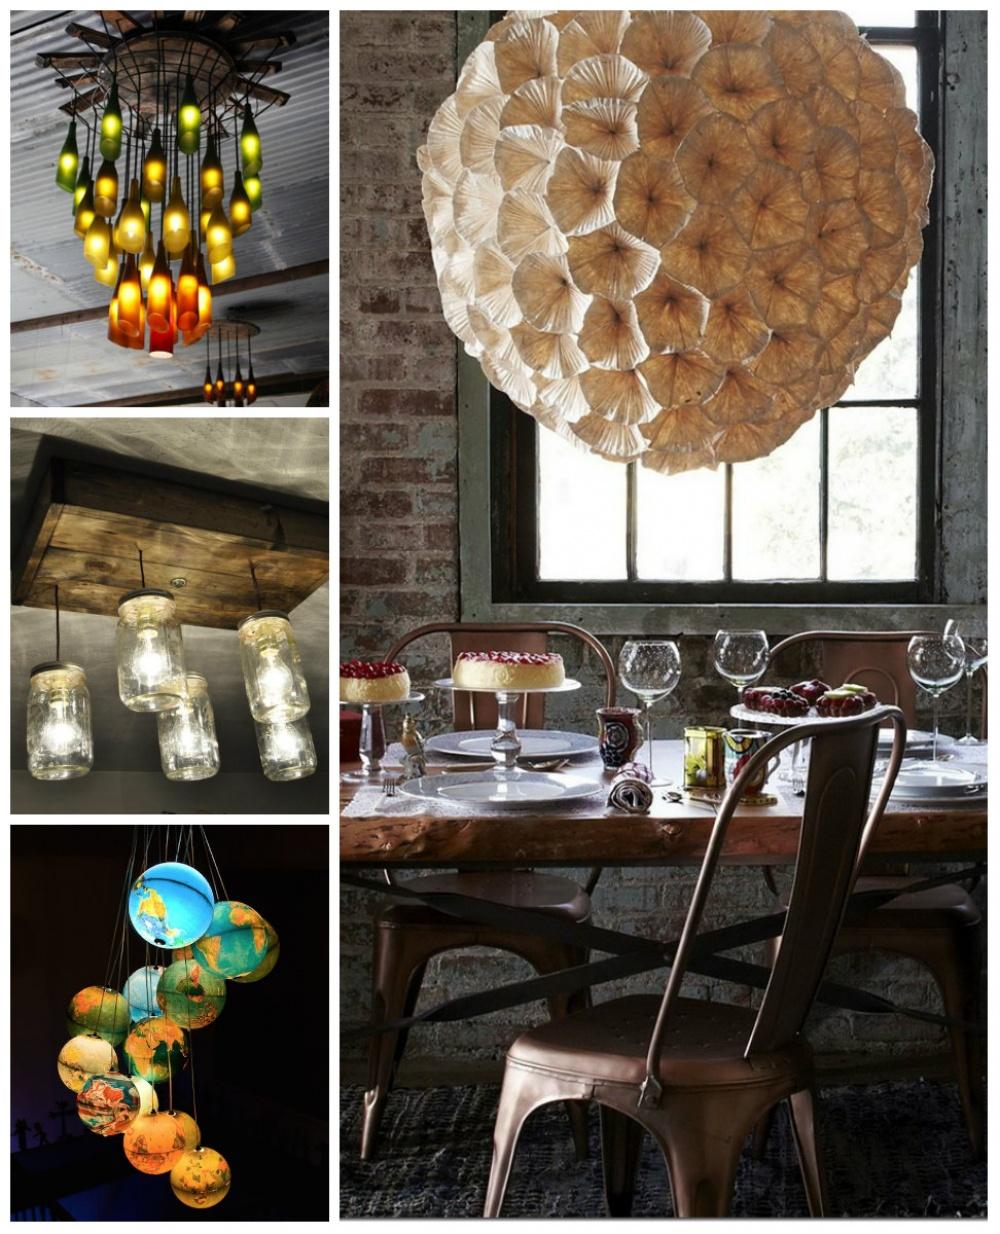 12-inexpensive-ways-to-make-simple-apartment-a-work-of-art-artnaz-com-9